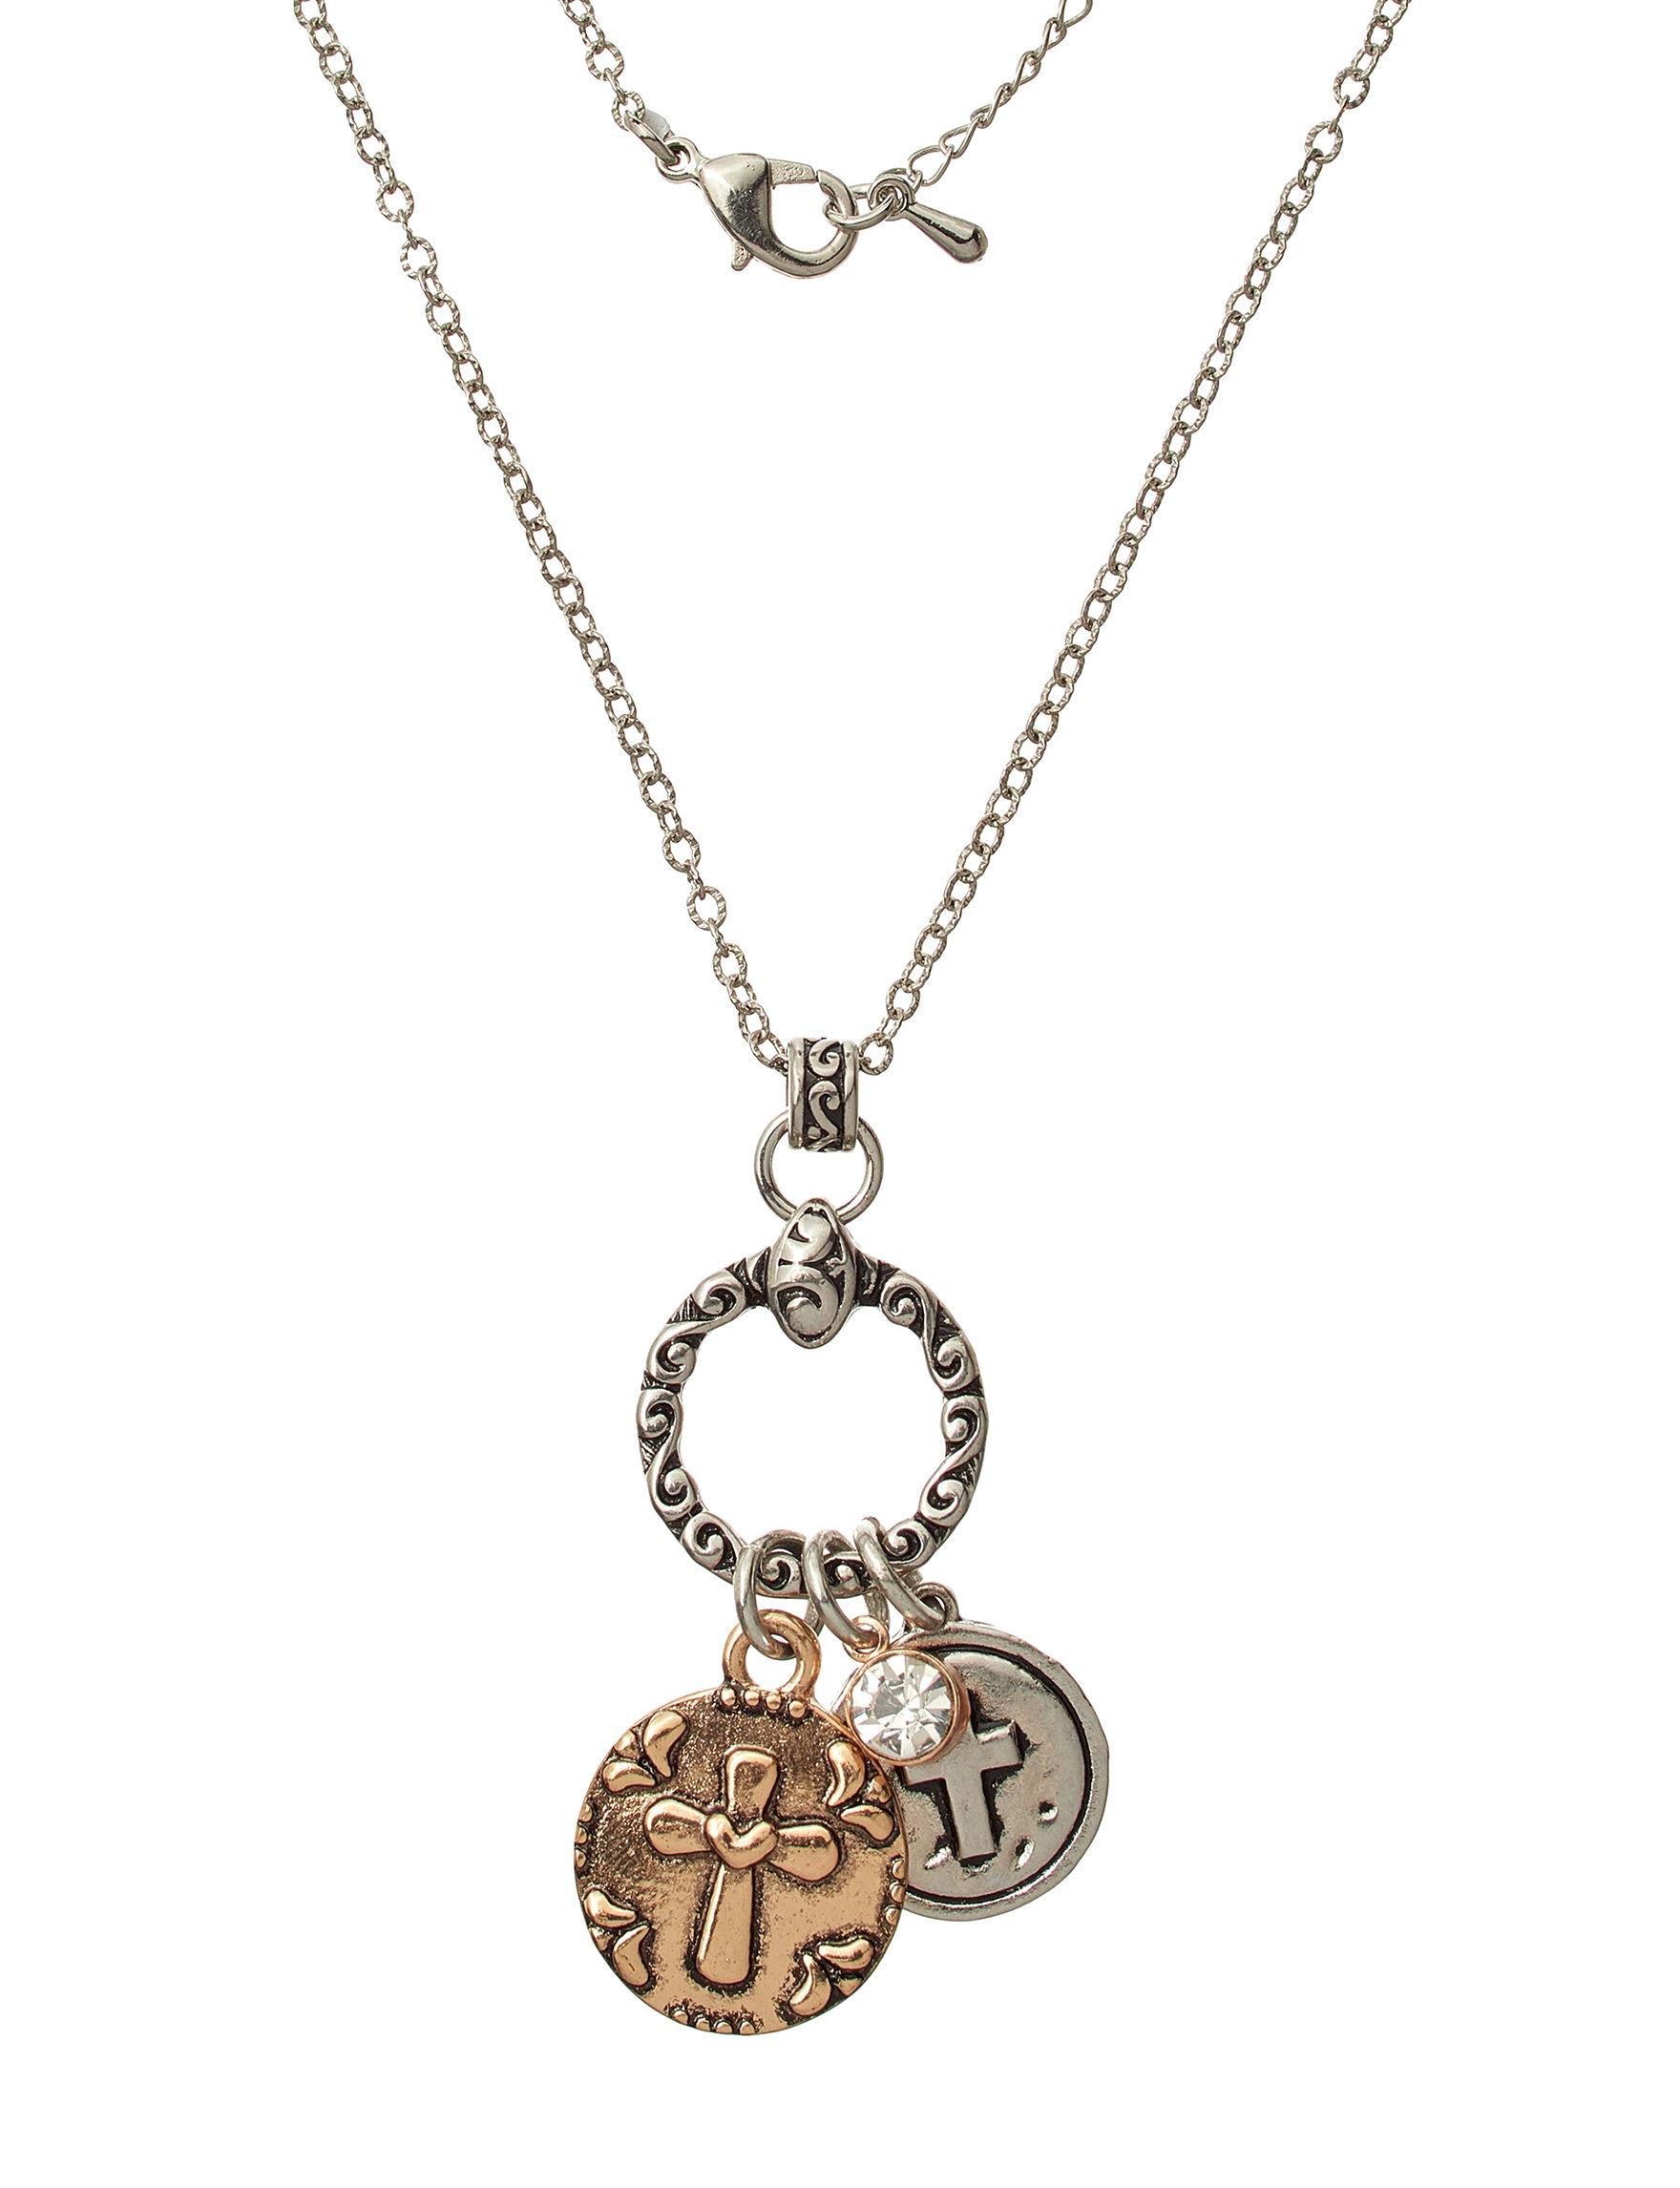 NES Silver / Brown Necklaces & Pendants Fine Jewelry